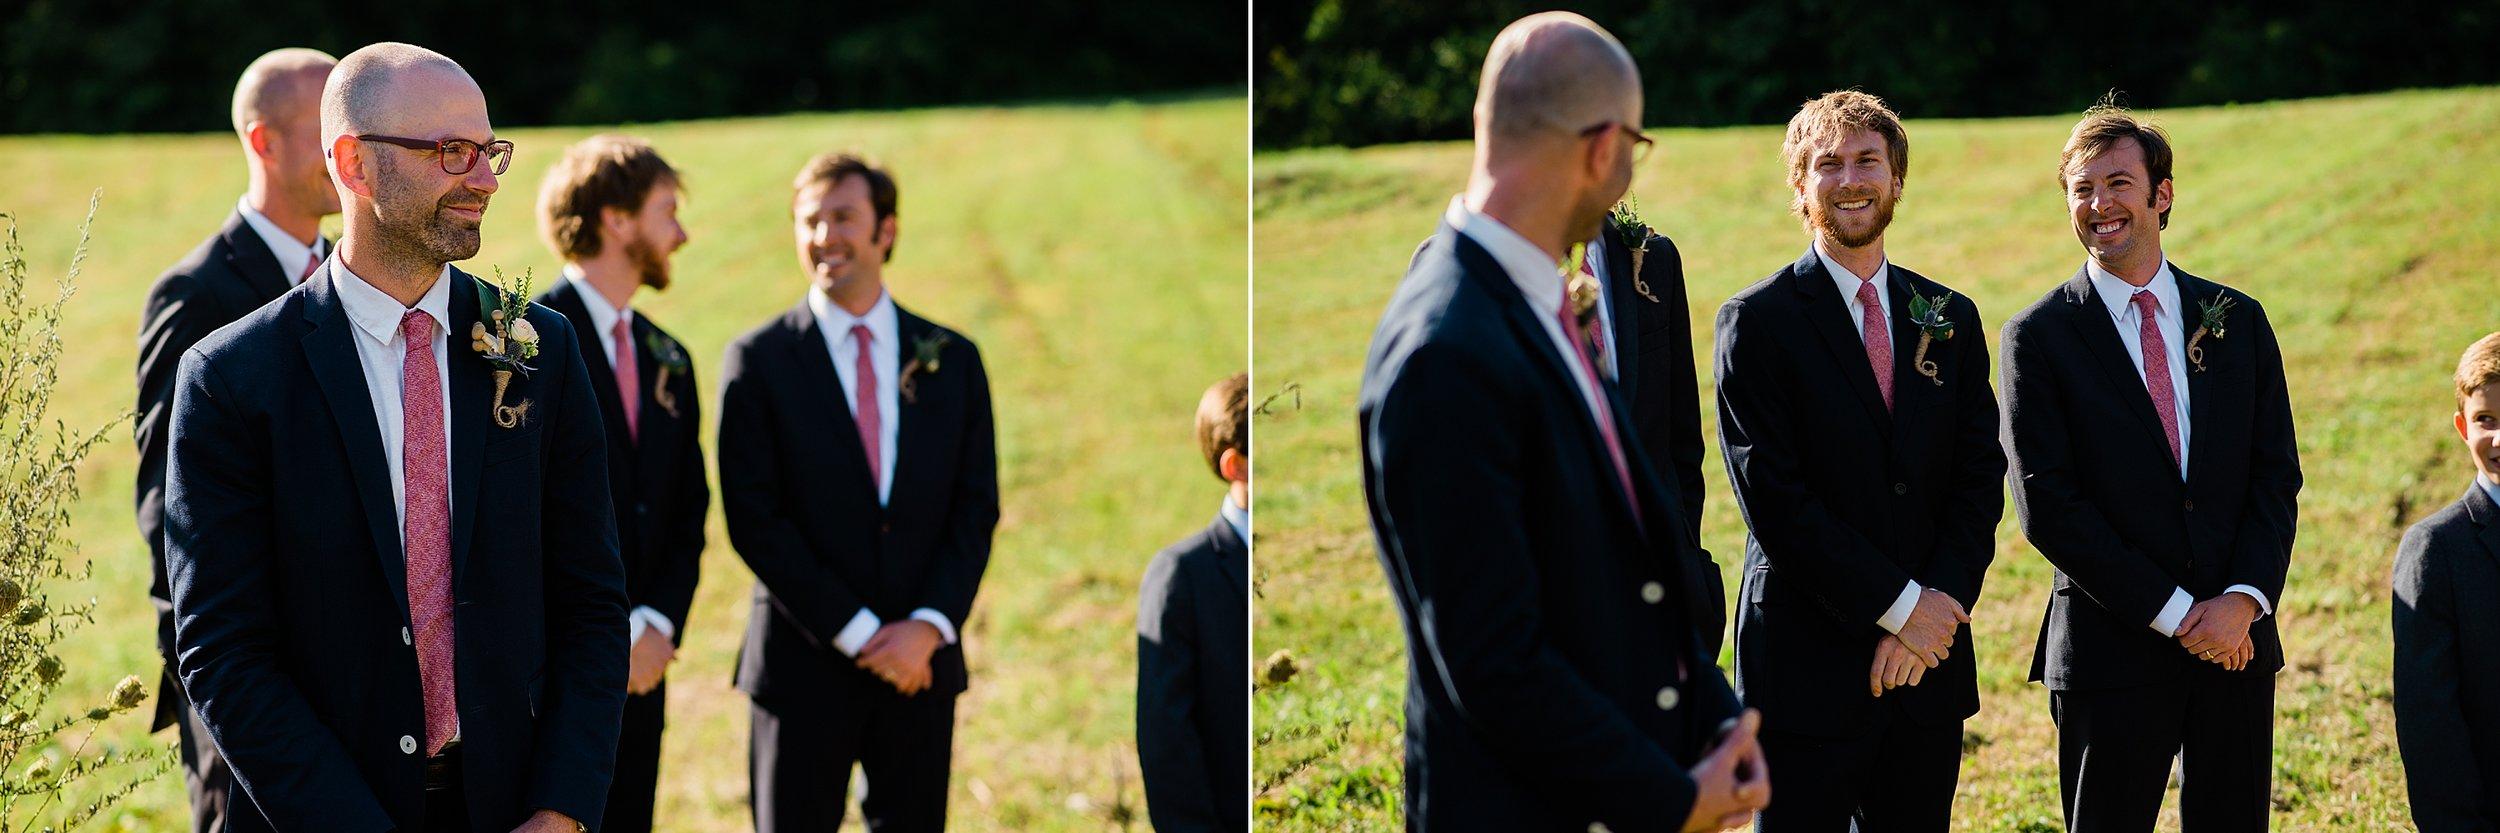 034 los angeles wedding photographer.jpg